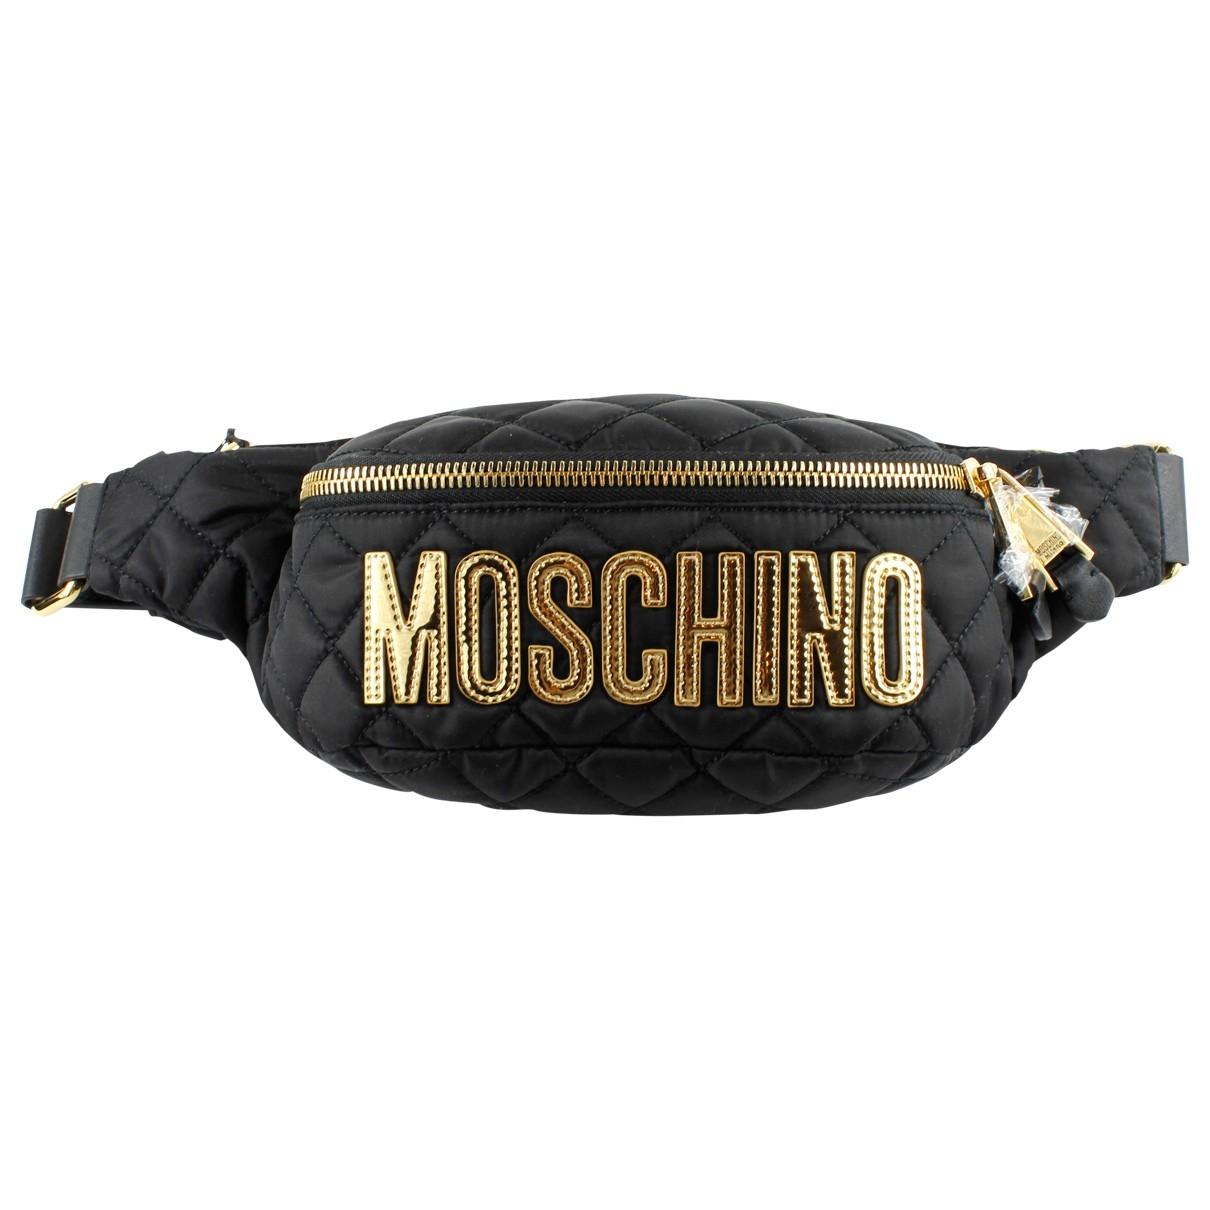 Moschino - Sac a main   pour femme en toile - noir